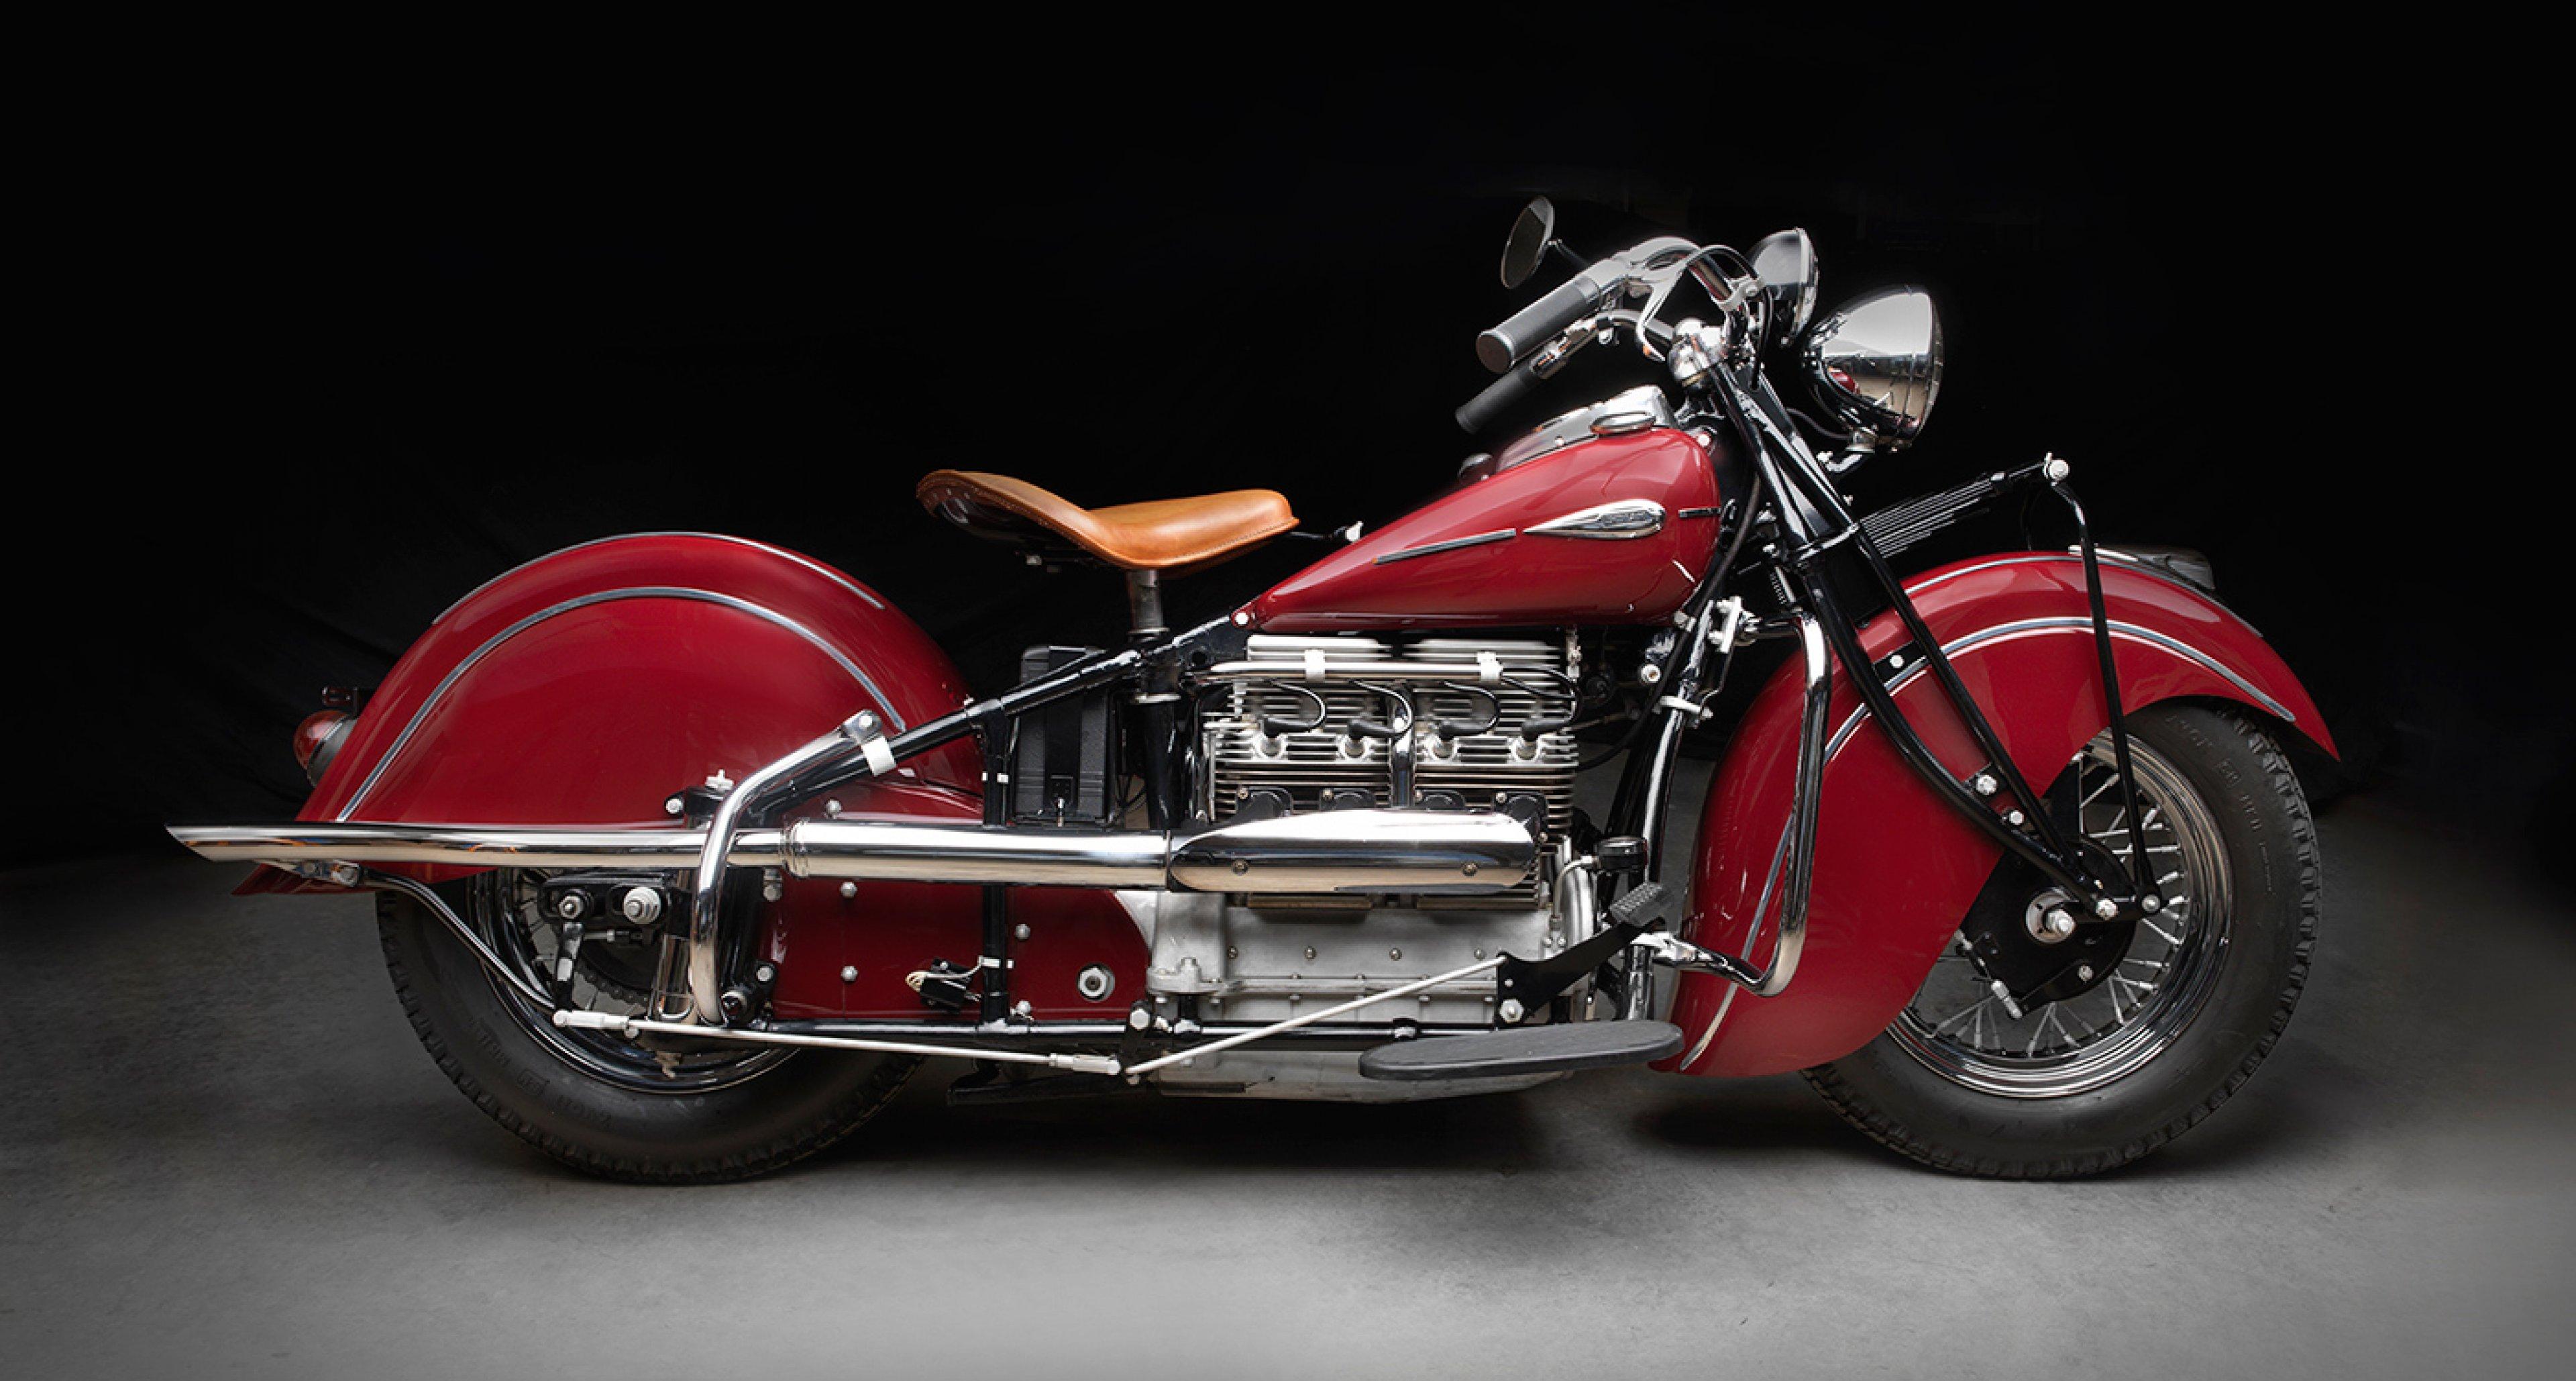 Indian 441 Series 4-Cylinder Motorcycle, 1941, Collection of Duane Van Fleet; Photo © 2016 Peter Harholdt